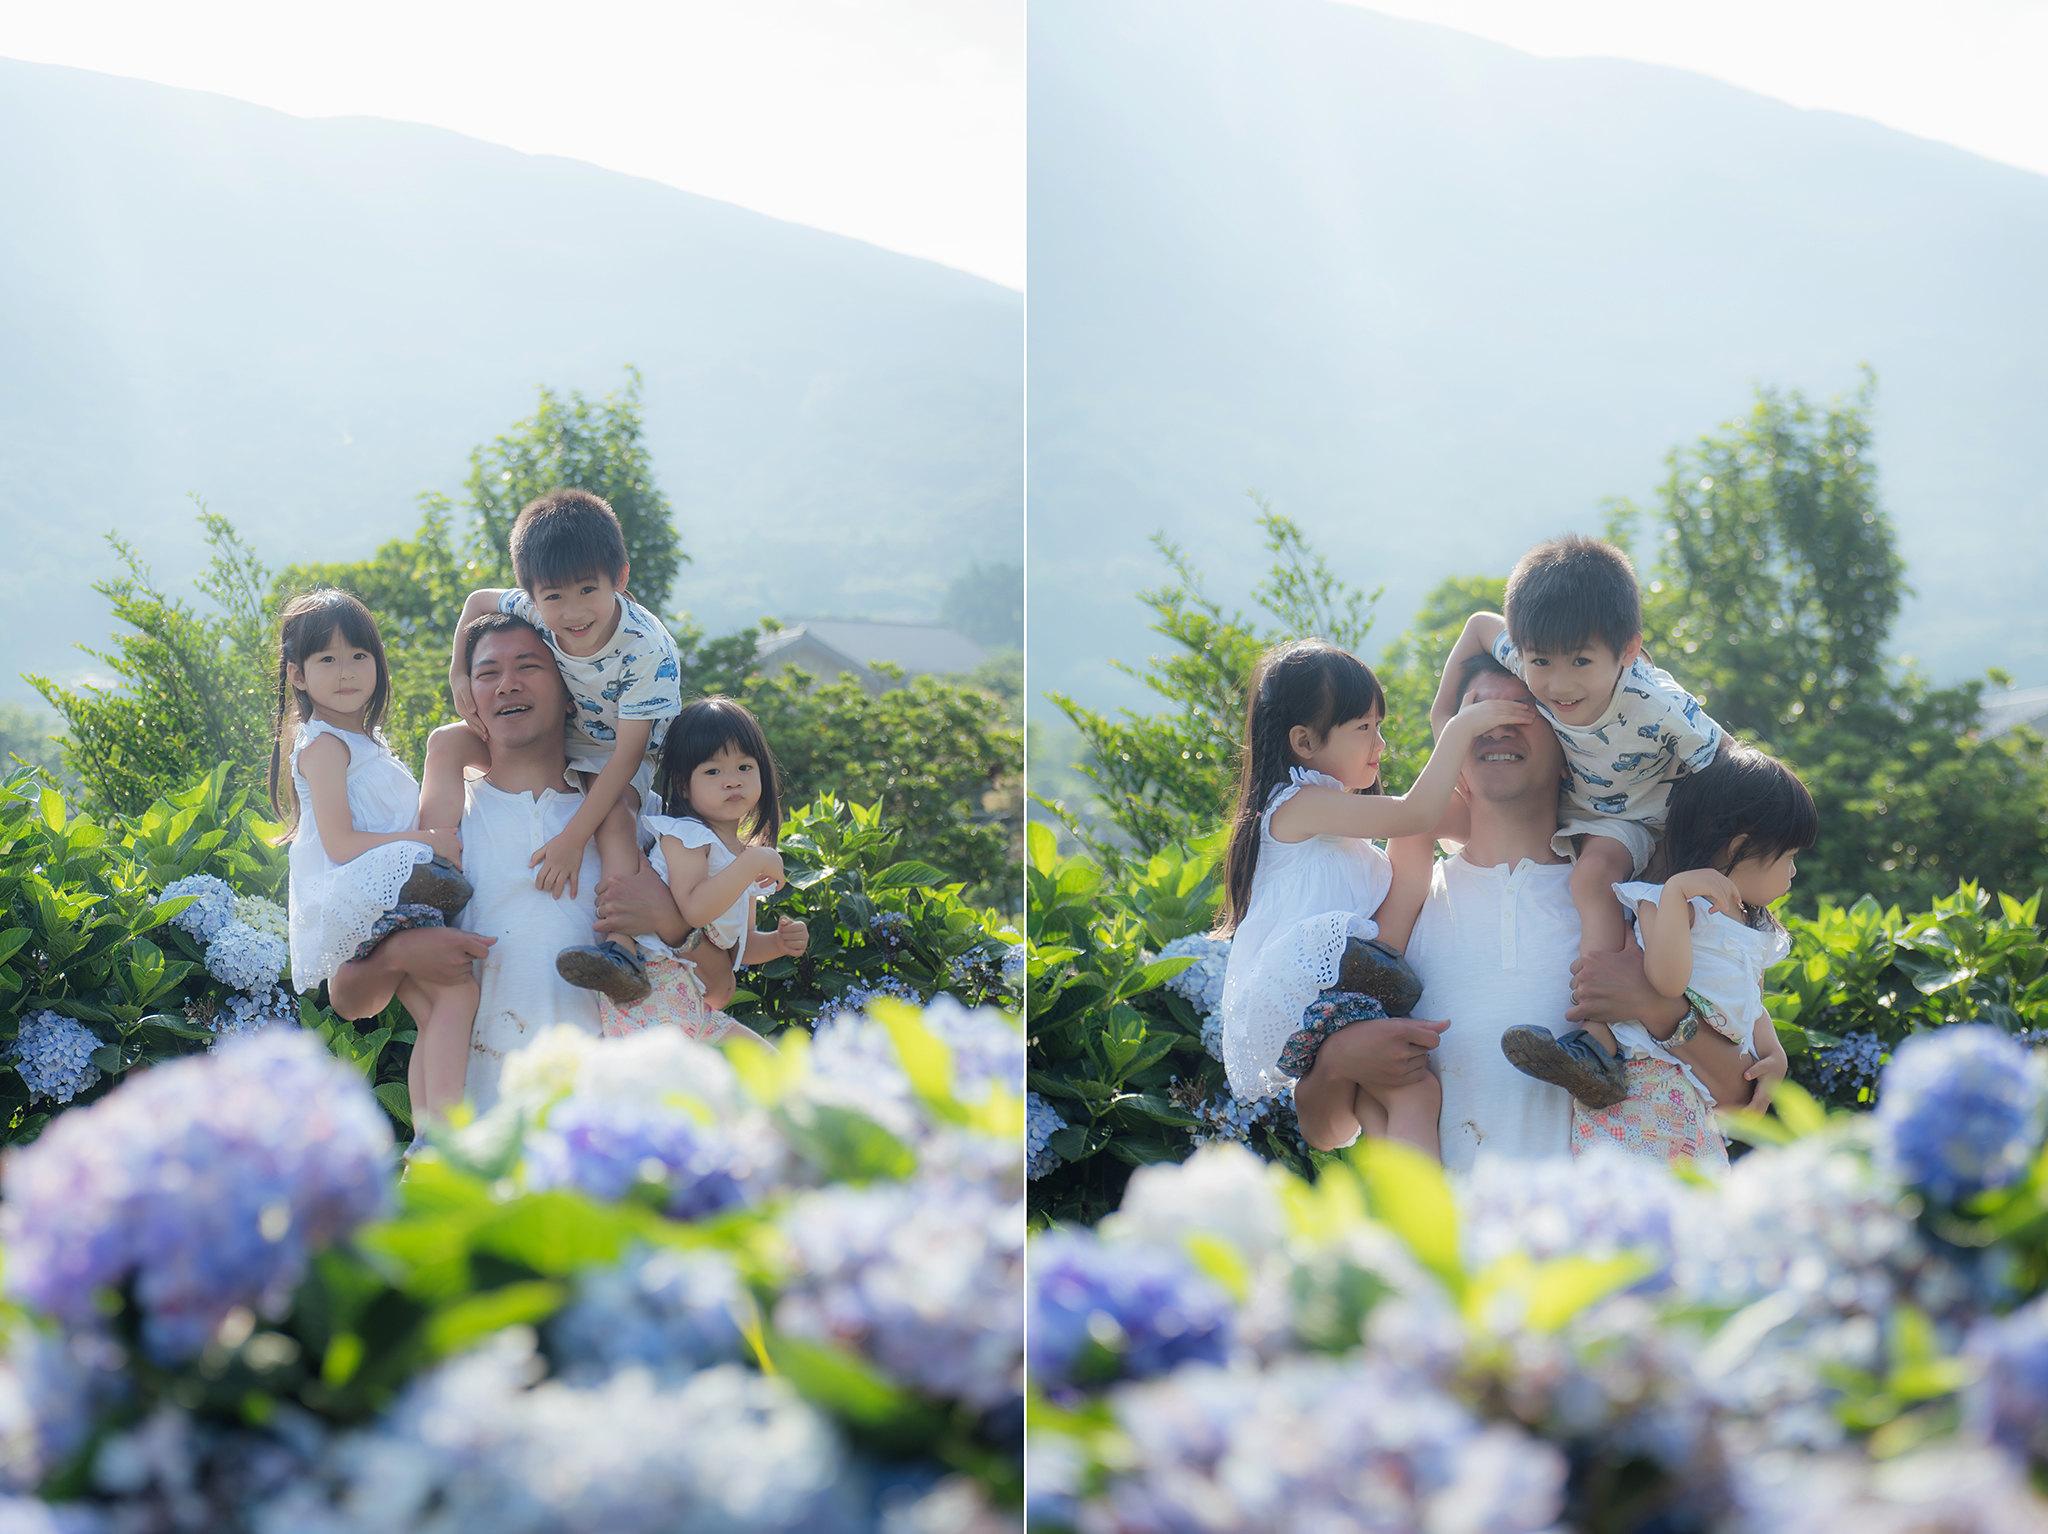 45051366051 3d4f9f867f k - 【親子寫真】+Cathy family+